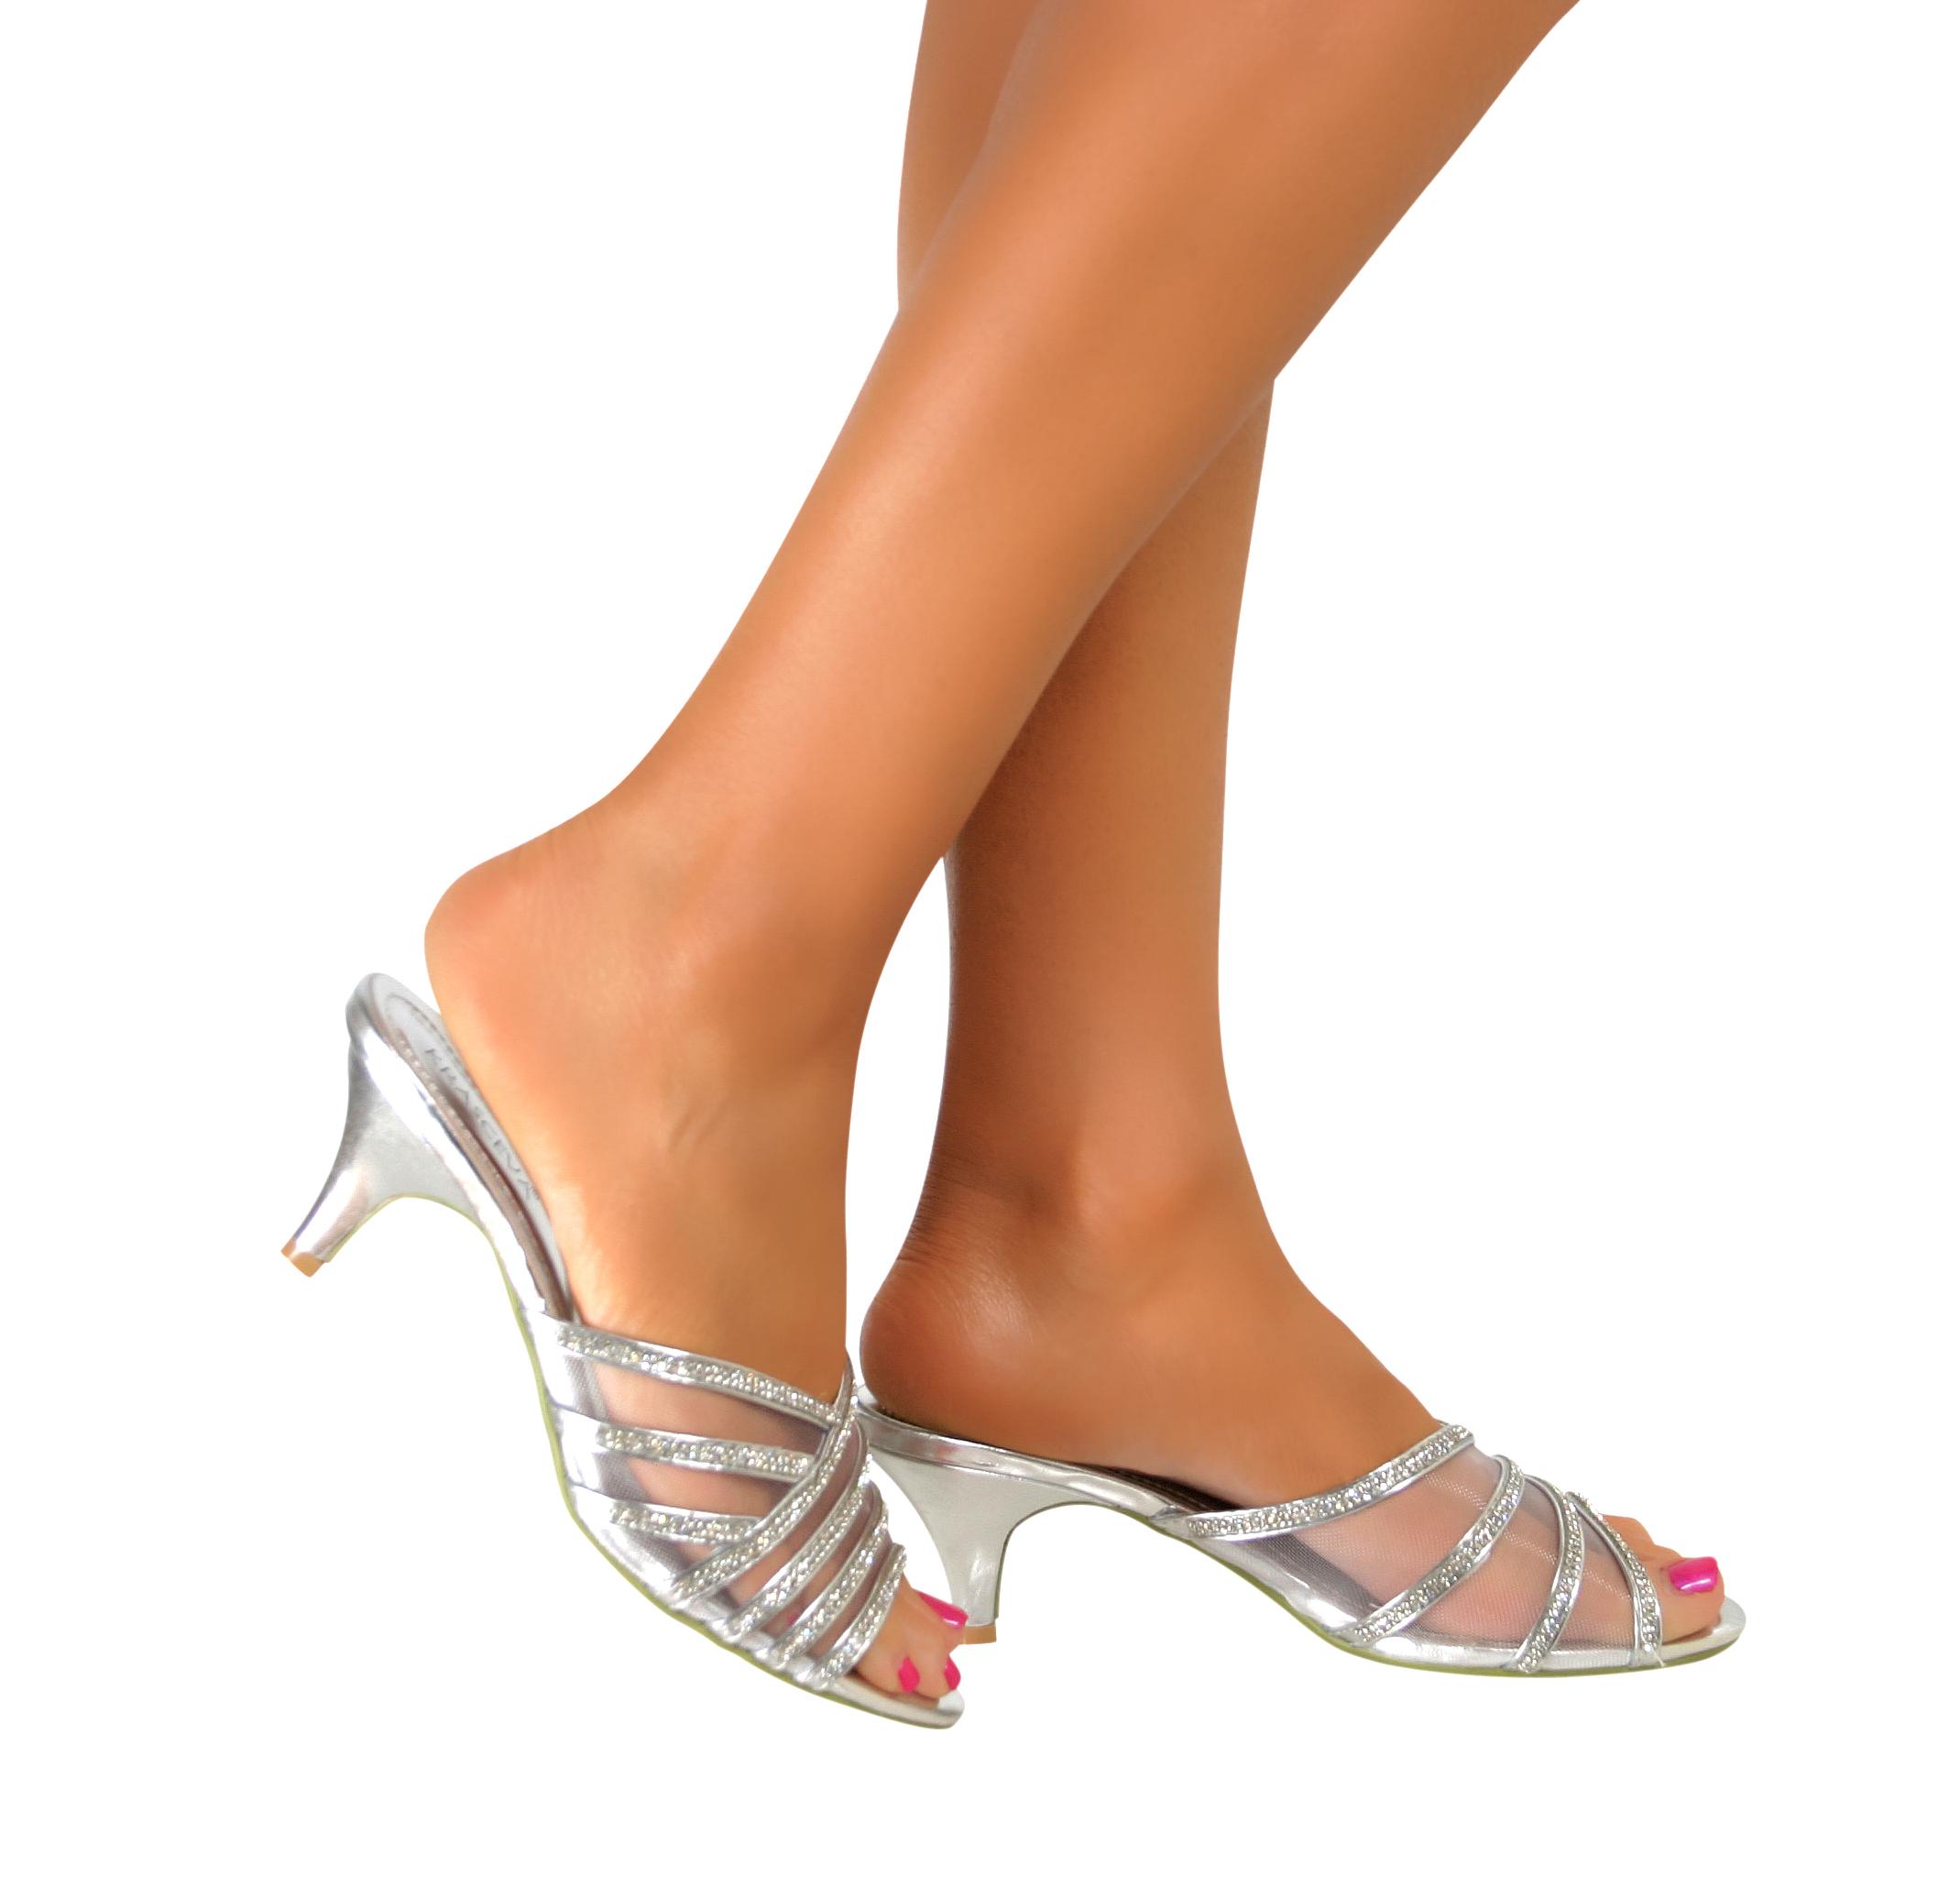 Ladies Womens Bridal Low Mid Heel Diamante Sandals Slip On Summer Mules Shoes